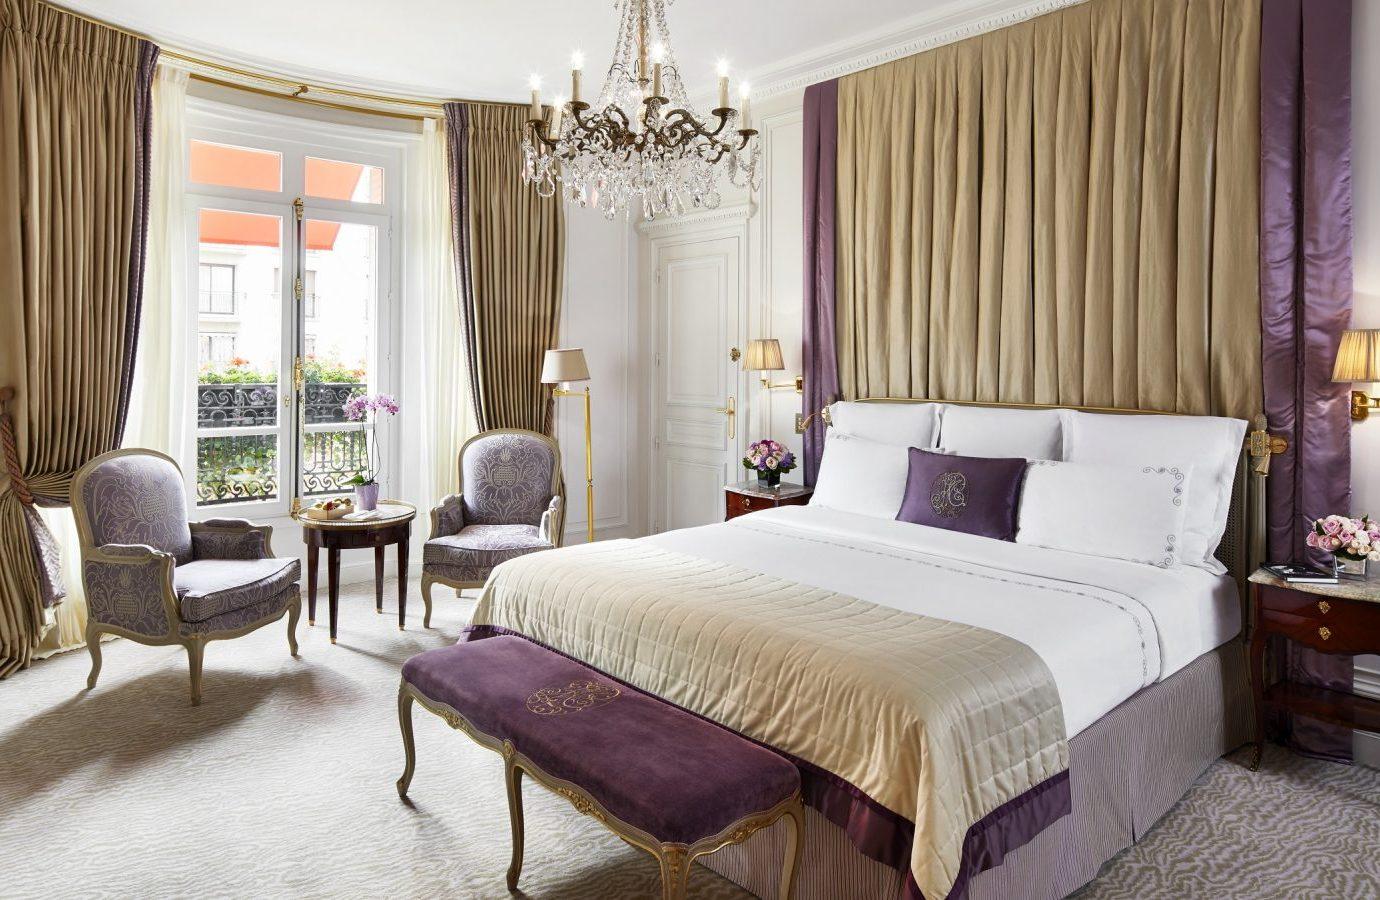 Bedroom at Hotel Plaza Athenee